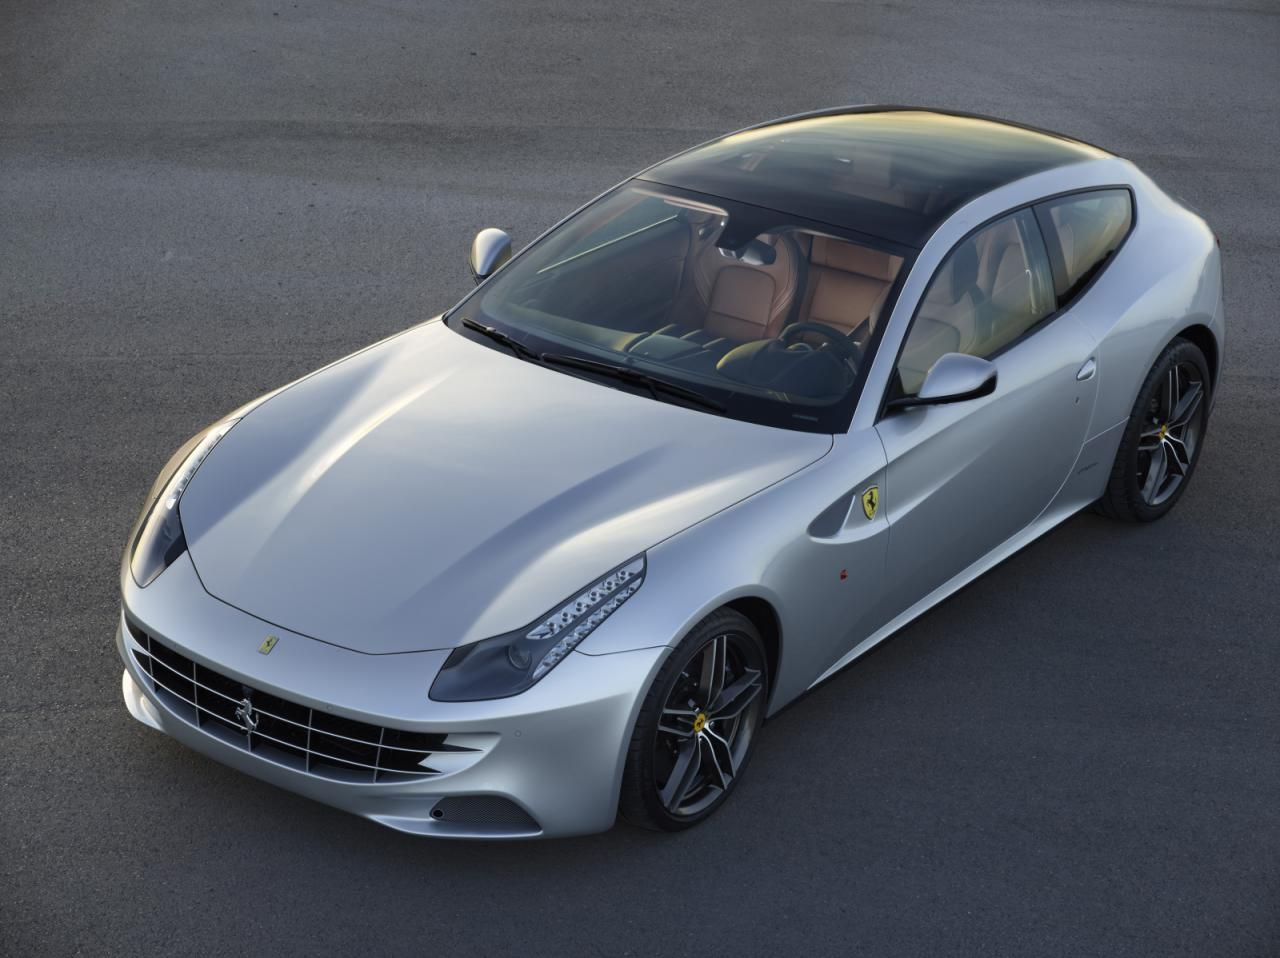 2013 Ferrari Ff Ferrari Porsche Cars Luxury Cars